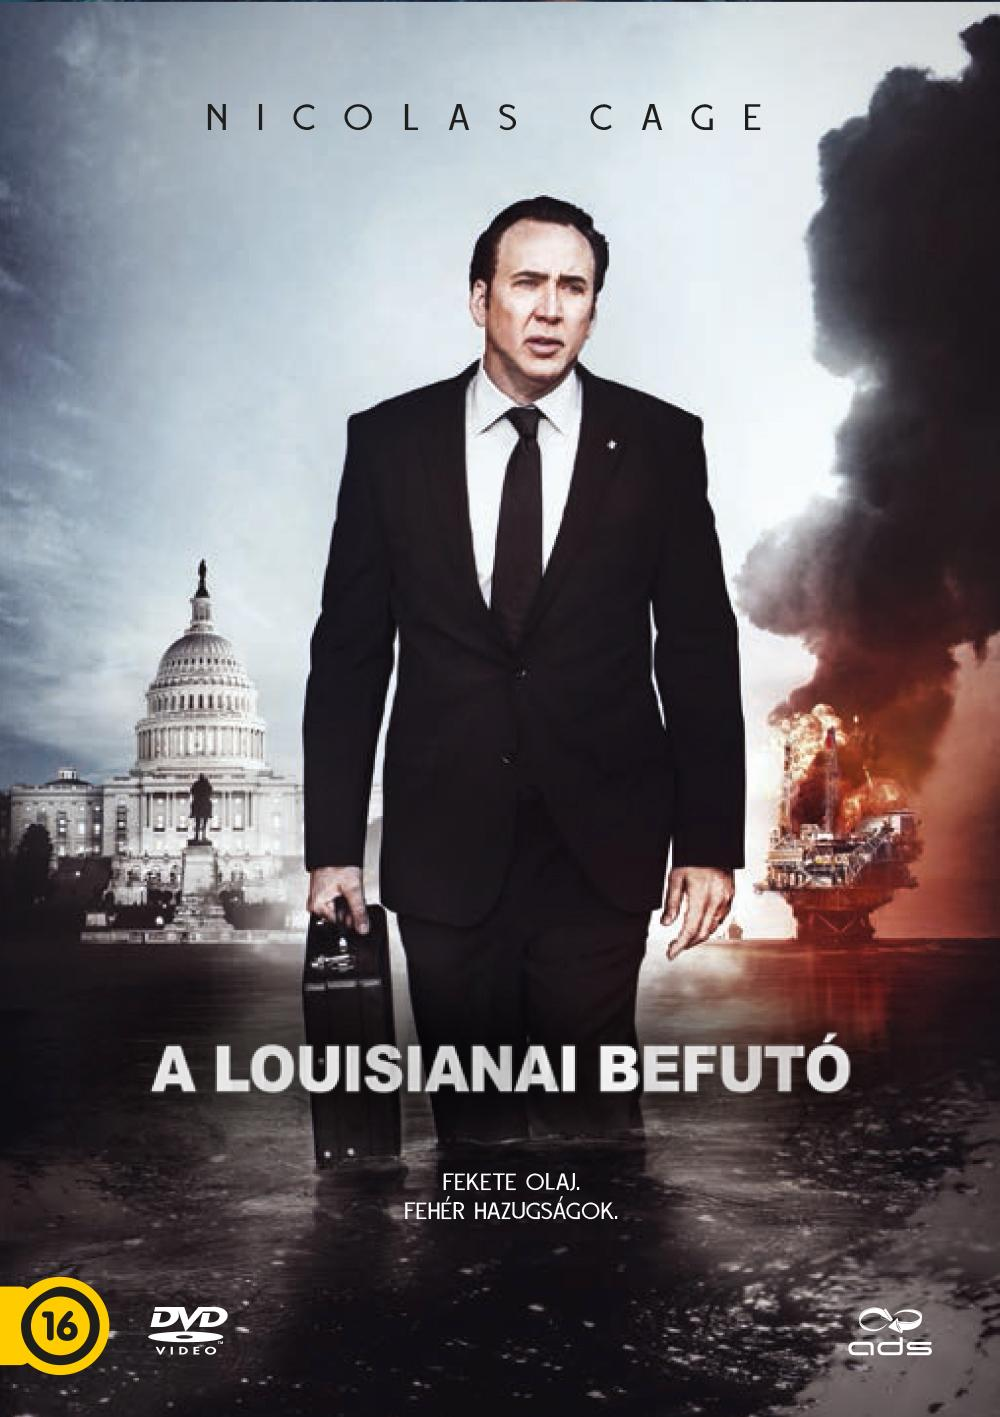 - A LOUISIANAI BEFUTÓ - DVD -